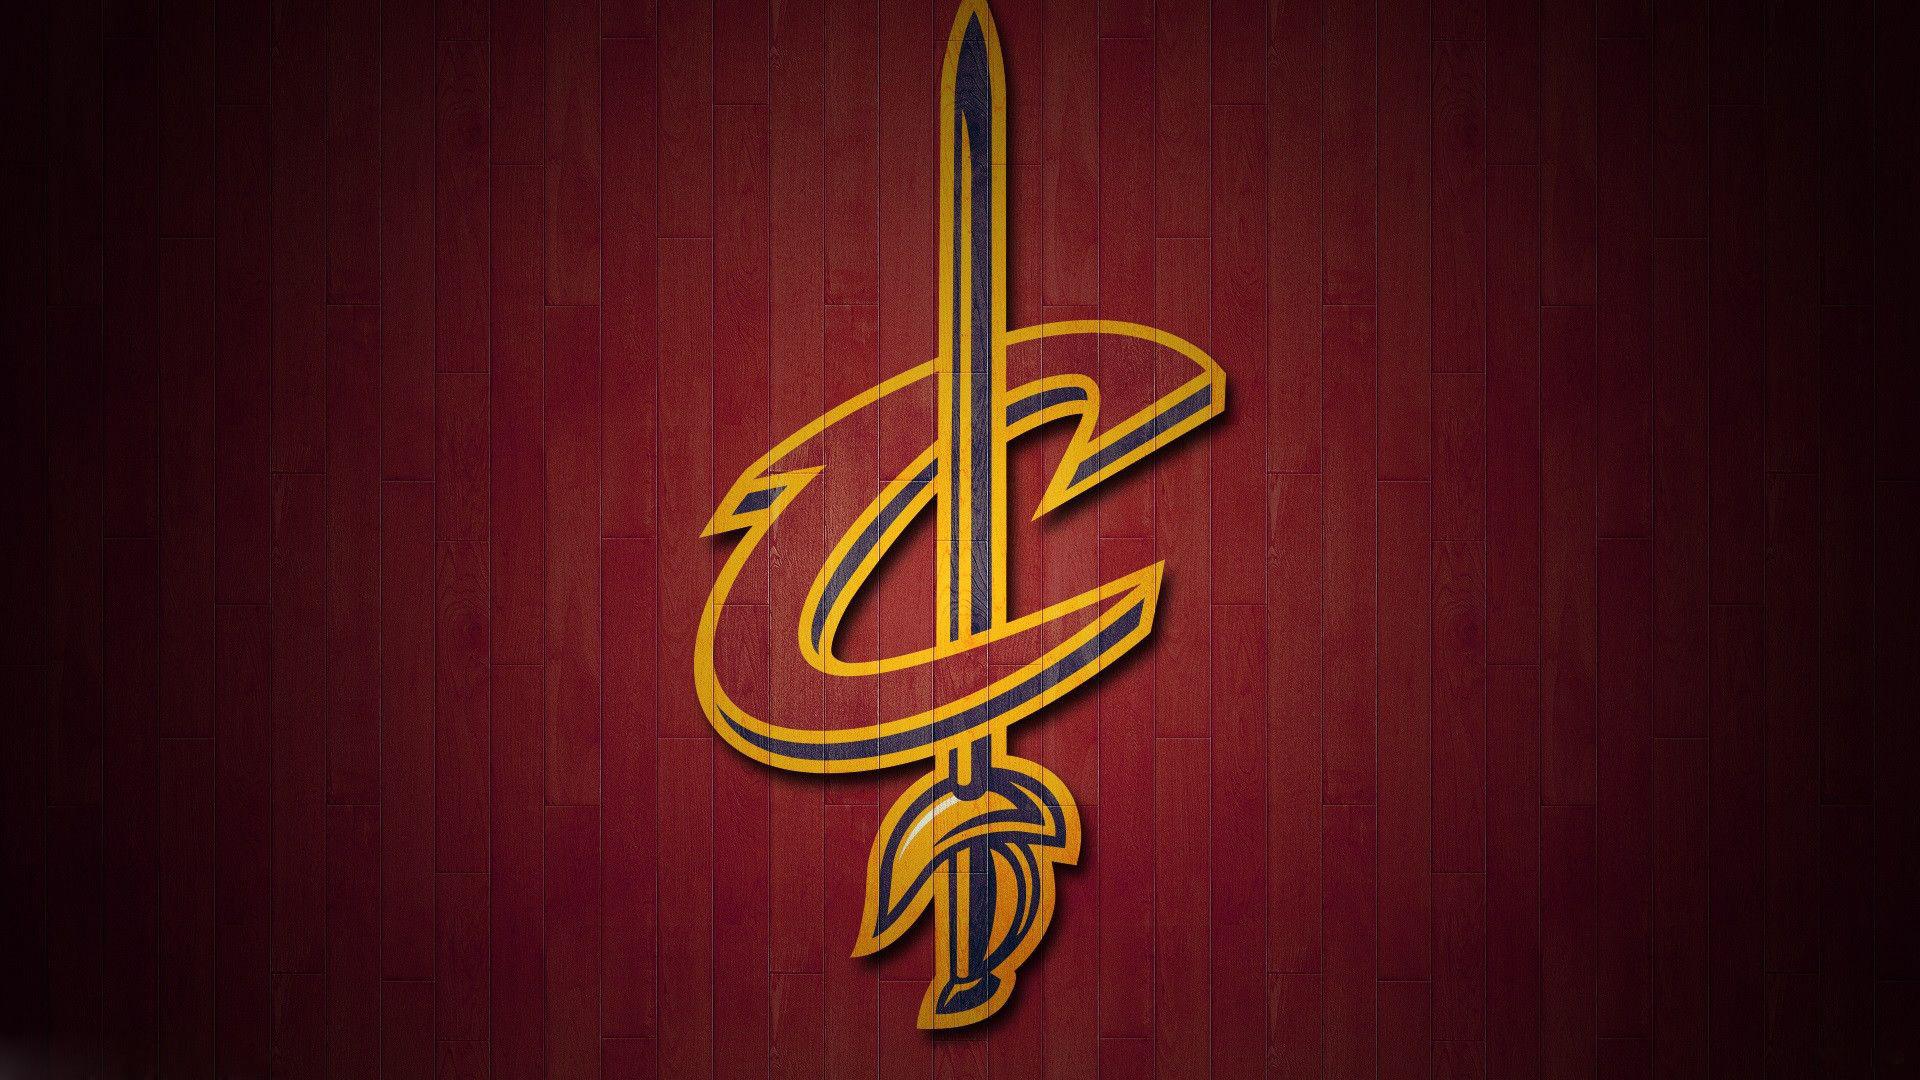 Great Wallpaper Home Screen Basketball - 715686-free-cleveland-cavaliers-basketball-wallpapers-1920x1080-samsung  2018_20169.jpg